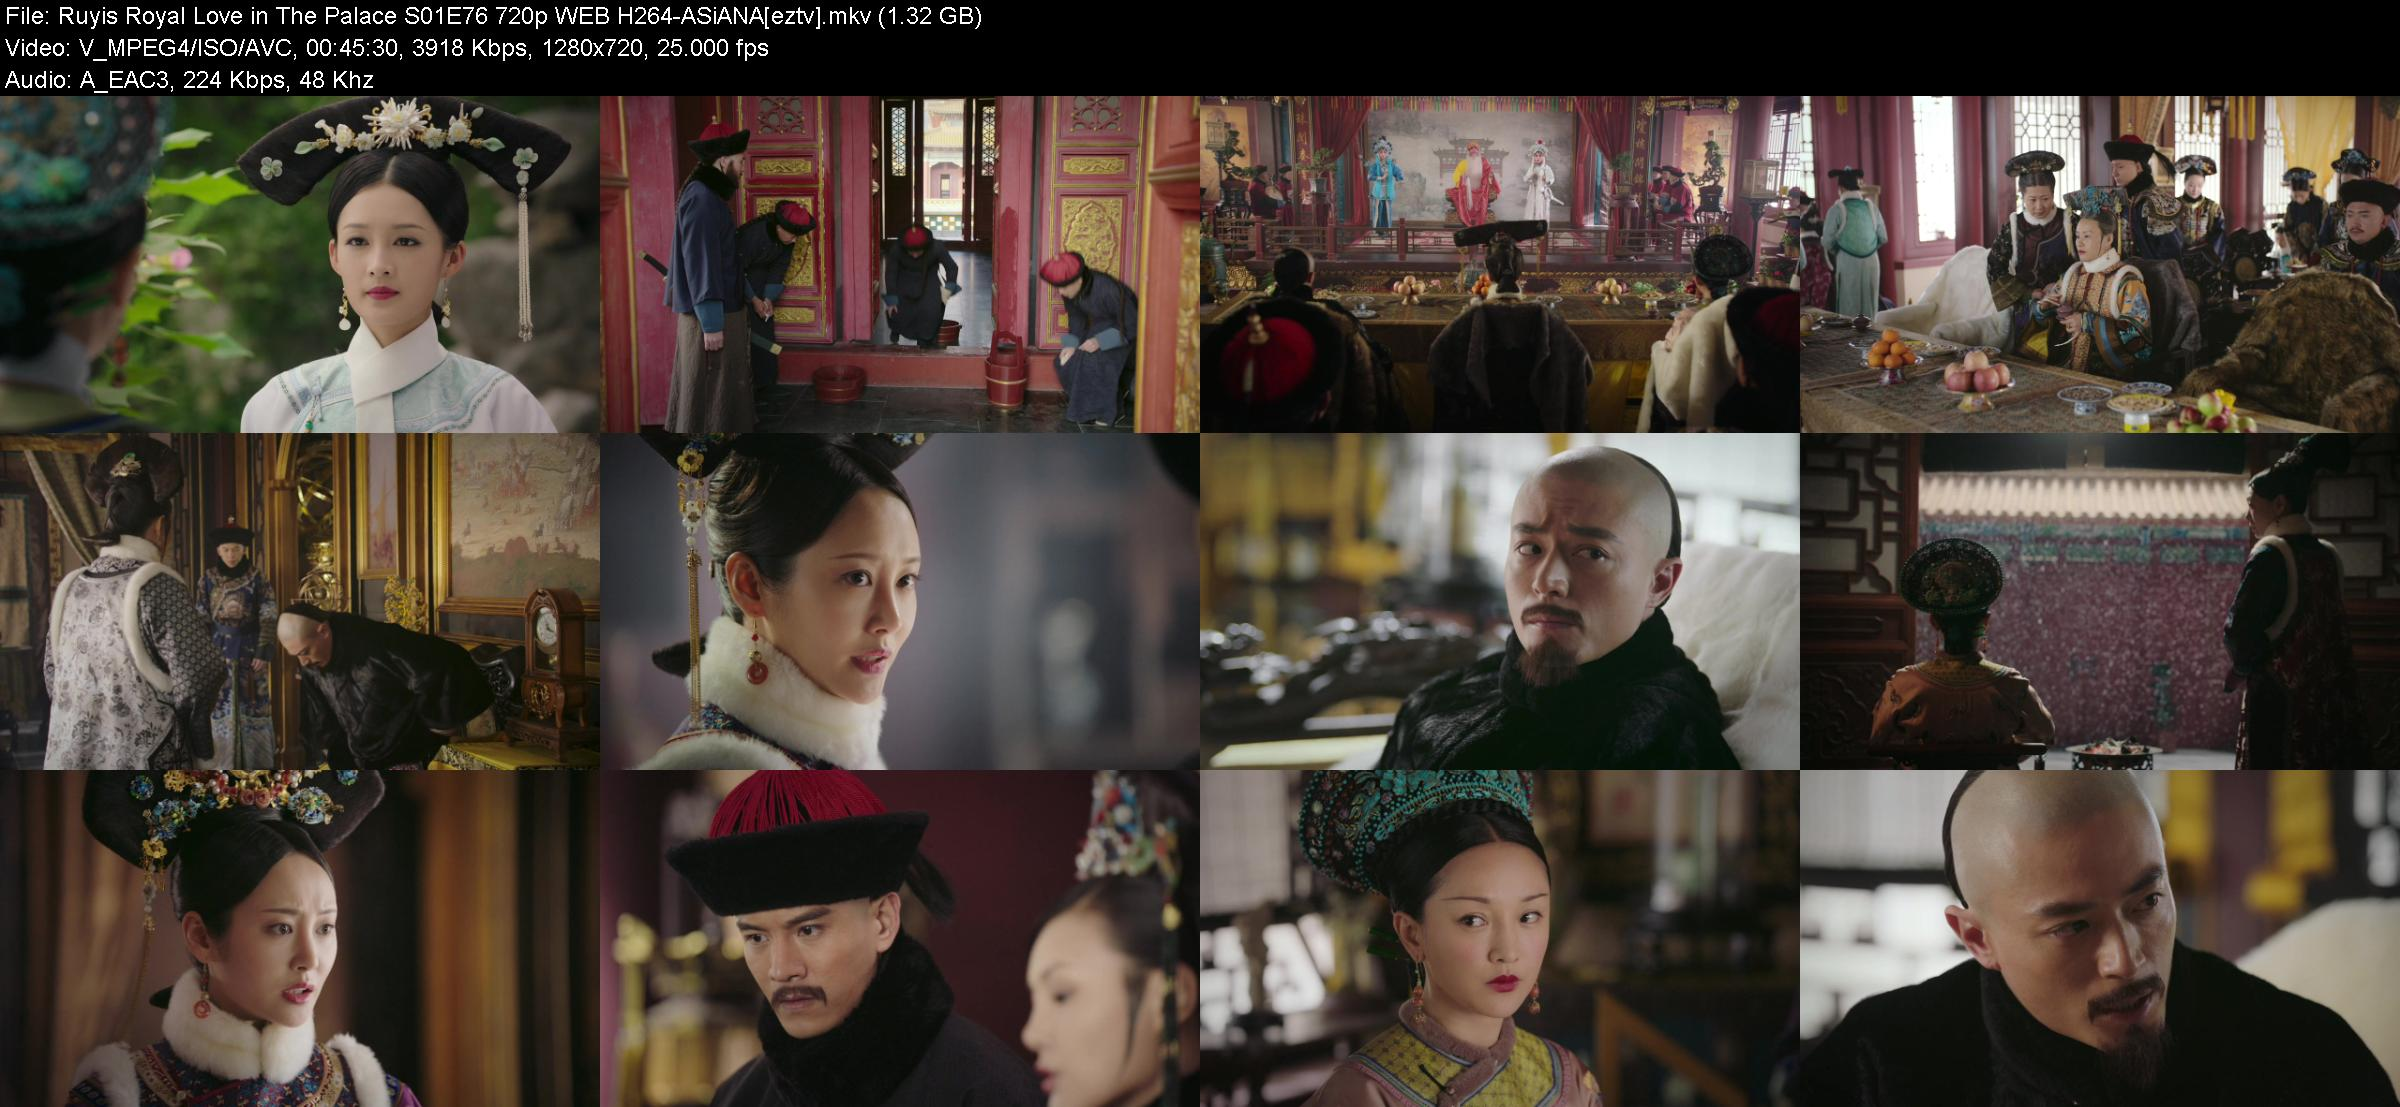 Ruyis Royal Love in The Palace S01E76 720p WEB H264-ASiANA